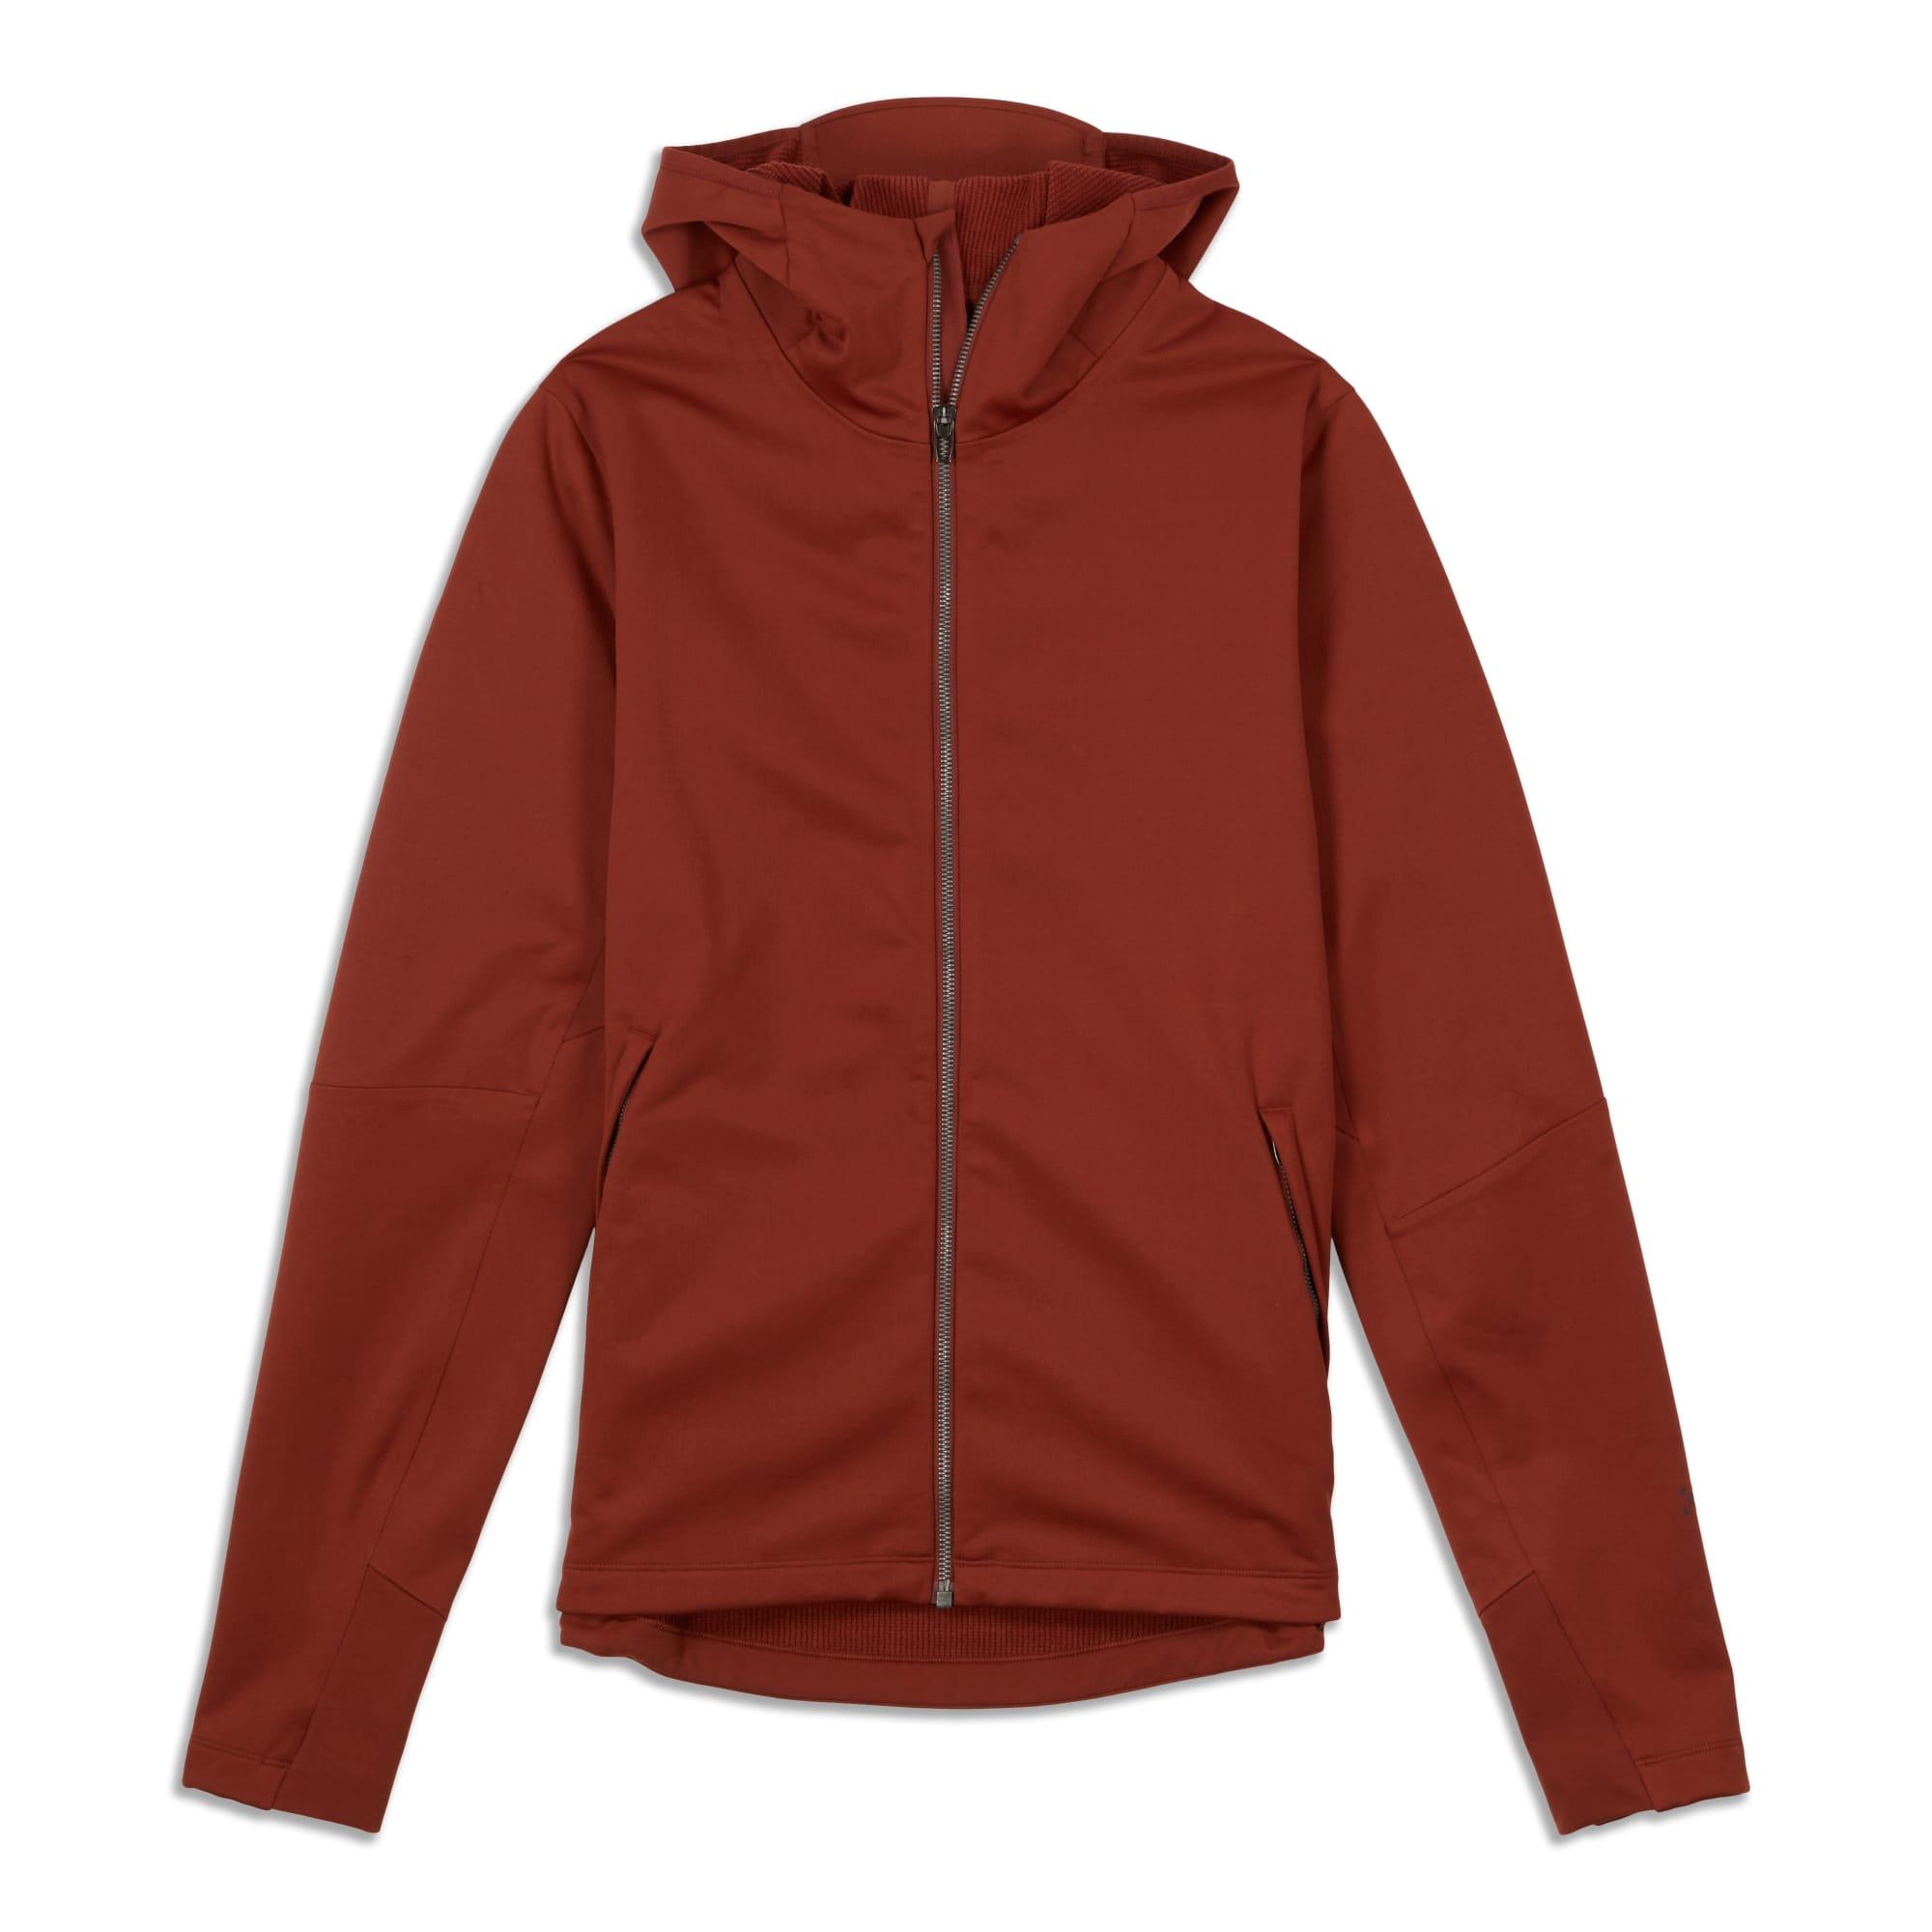 Main product image: Fleece Back Soft Shell Jacket - Resale